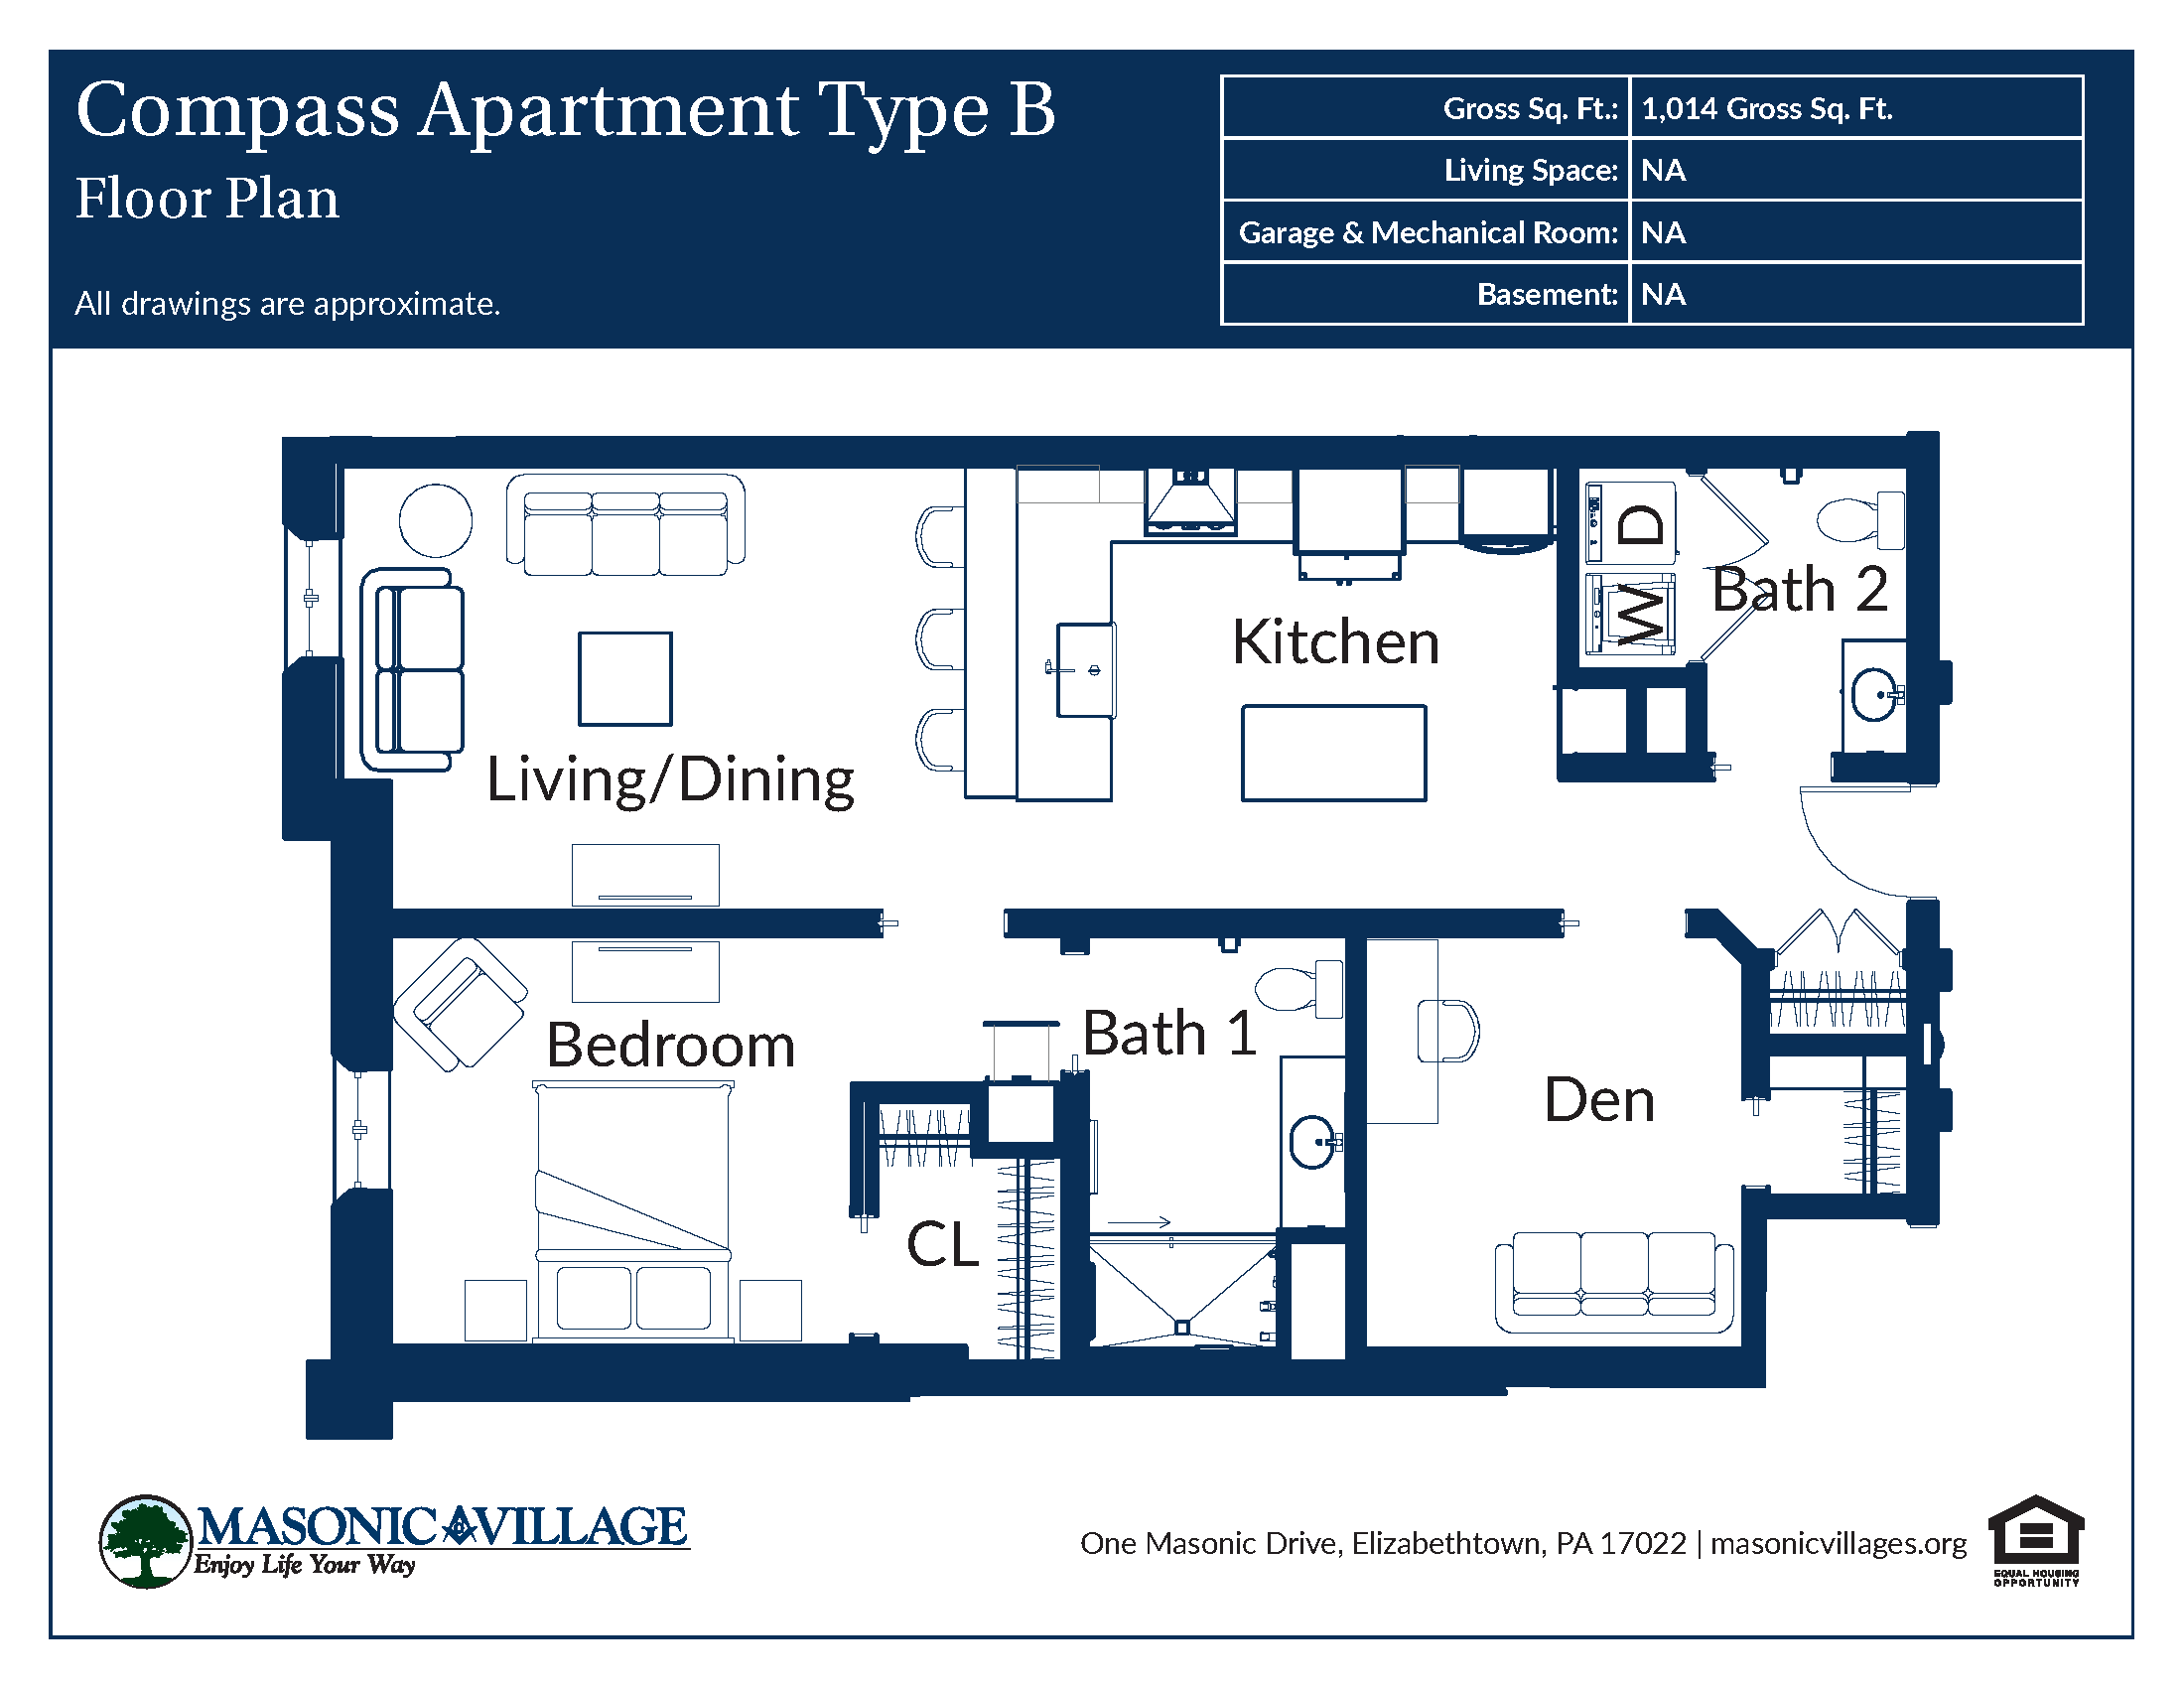 Masonic Village at Elizabethtown - Compass Apartment B Floor Plan